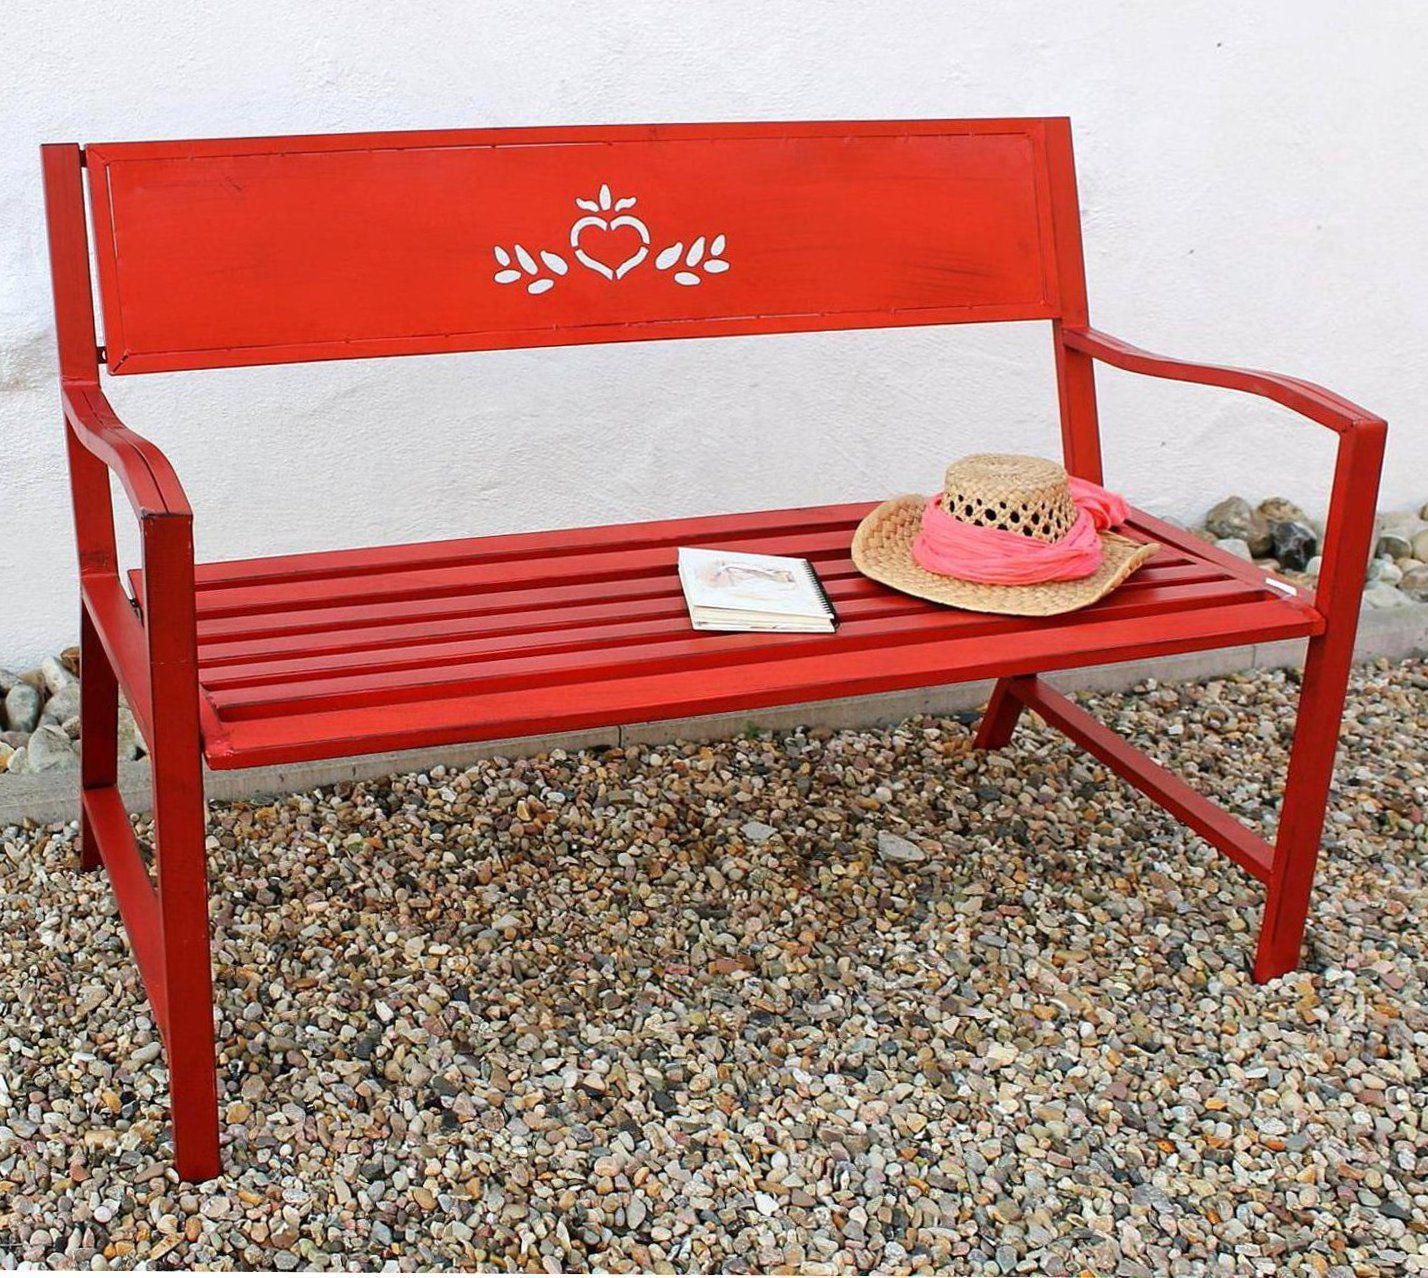 bank passion gartenbank rot 121496 sitzbank 120 cm metall eisen blumenbank ebay. Black Bedroom Furniture Sets. Home Design Ideas